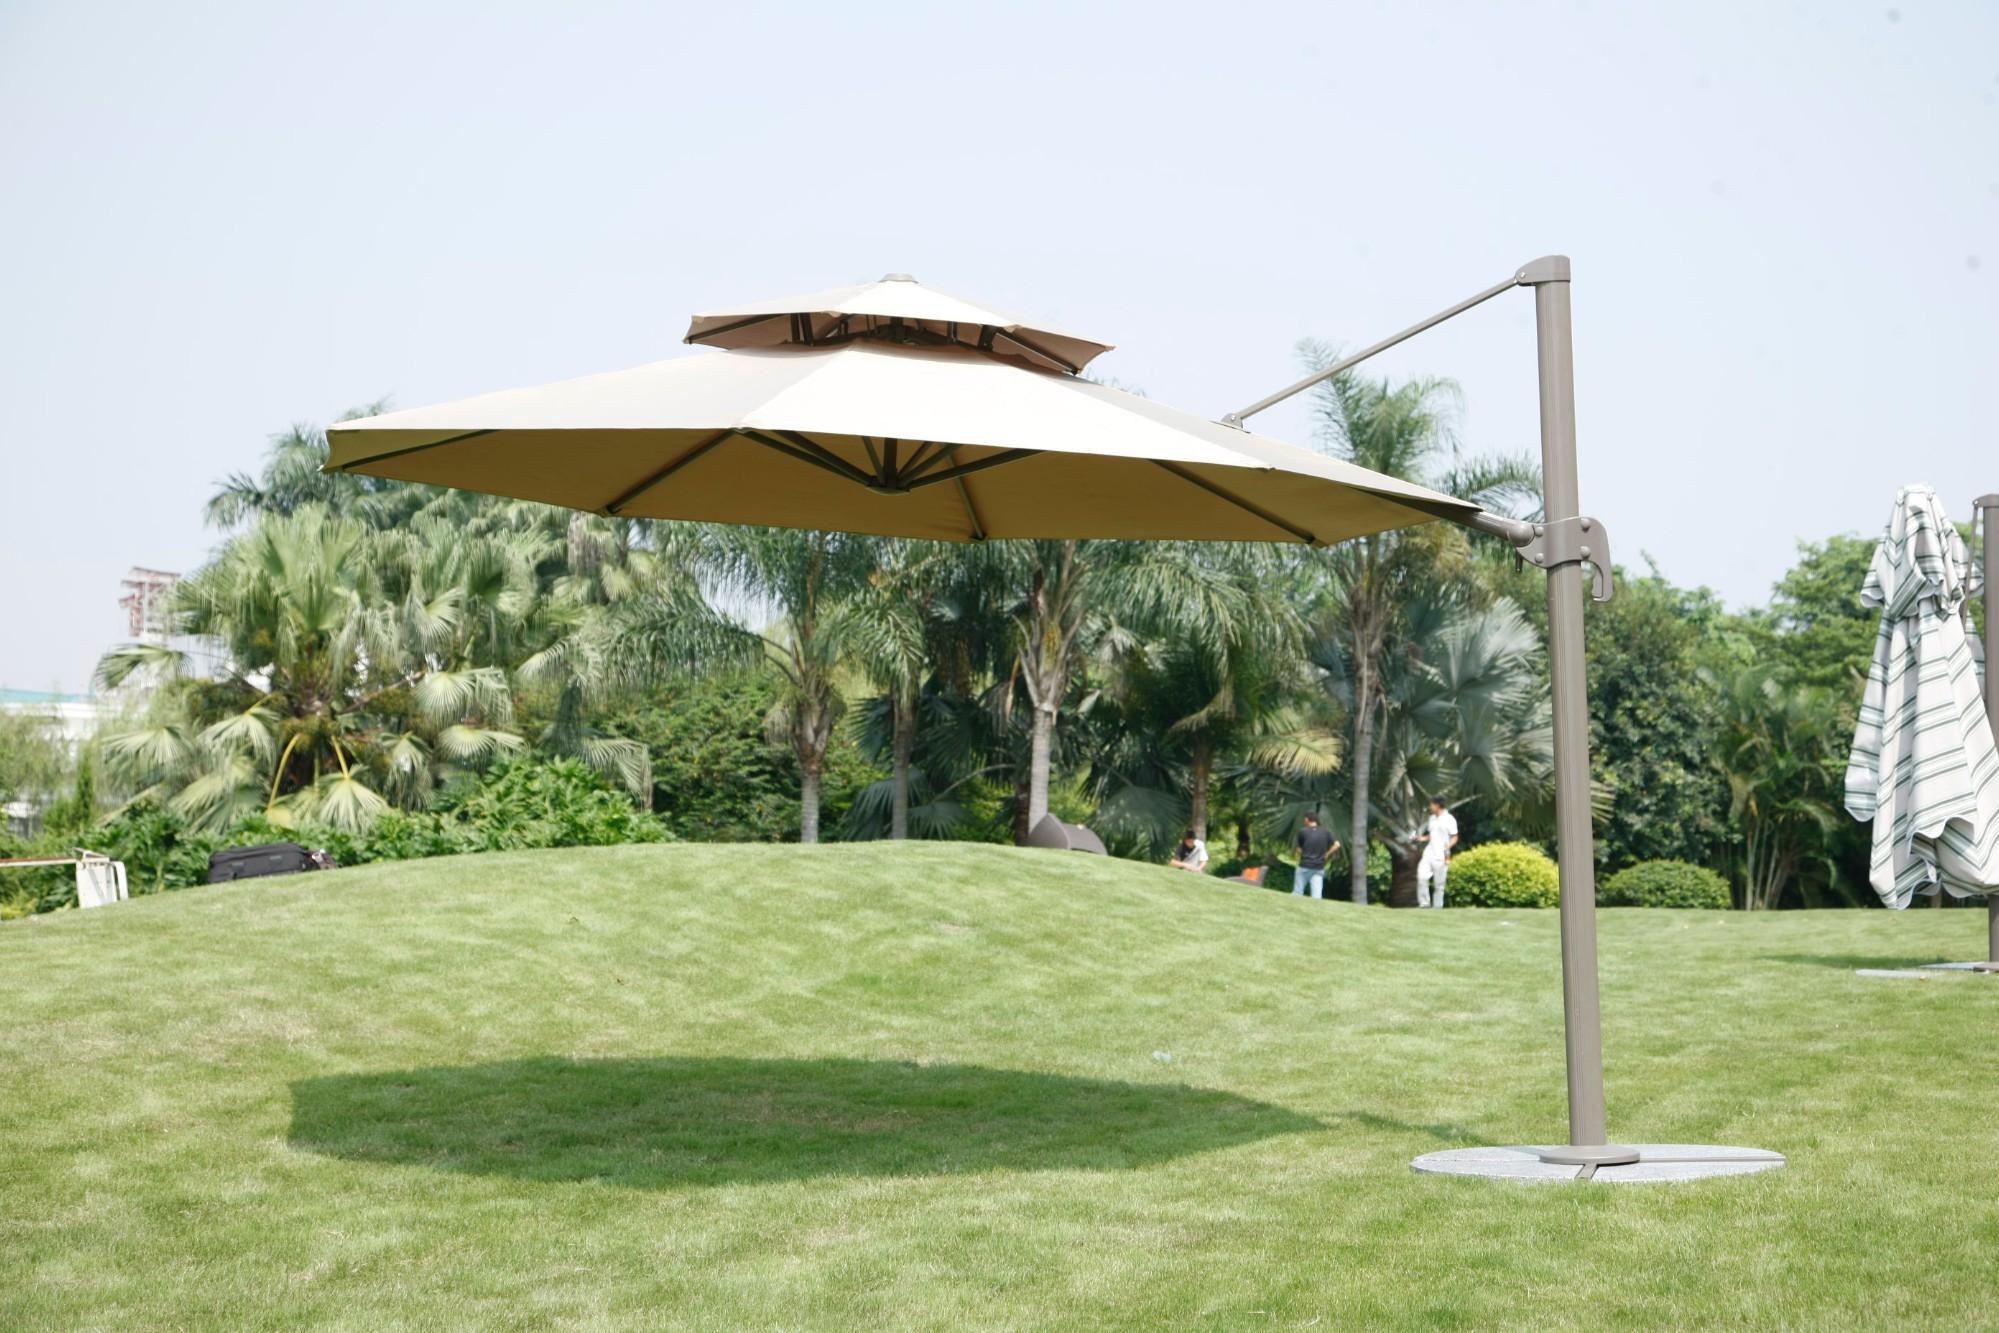 Outdoor Furniture Garden Double Canopy Umbrella Parasol Manufacturers, Outdoor Furniture Garden Double Canopy Umbrella Parasol Factory, Supply Outdoor Furniture Garden Double Canopy Umbrella Parasol